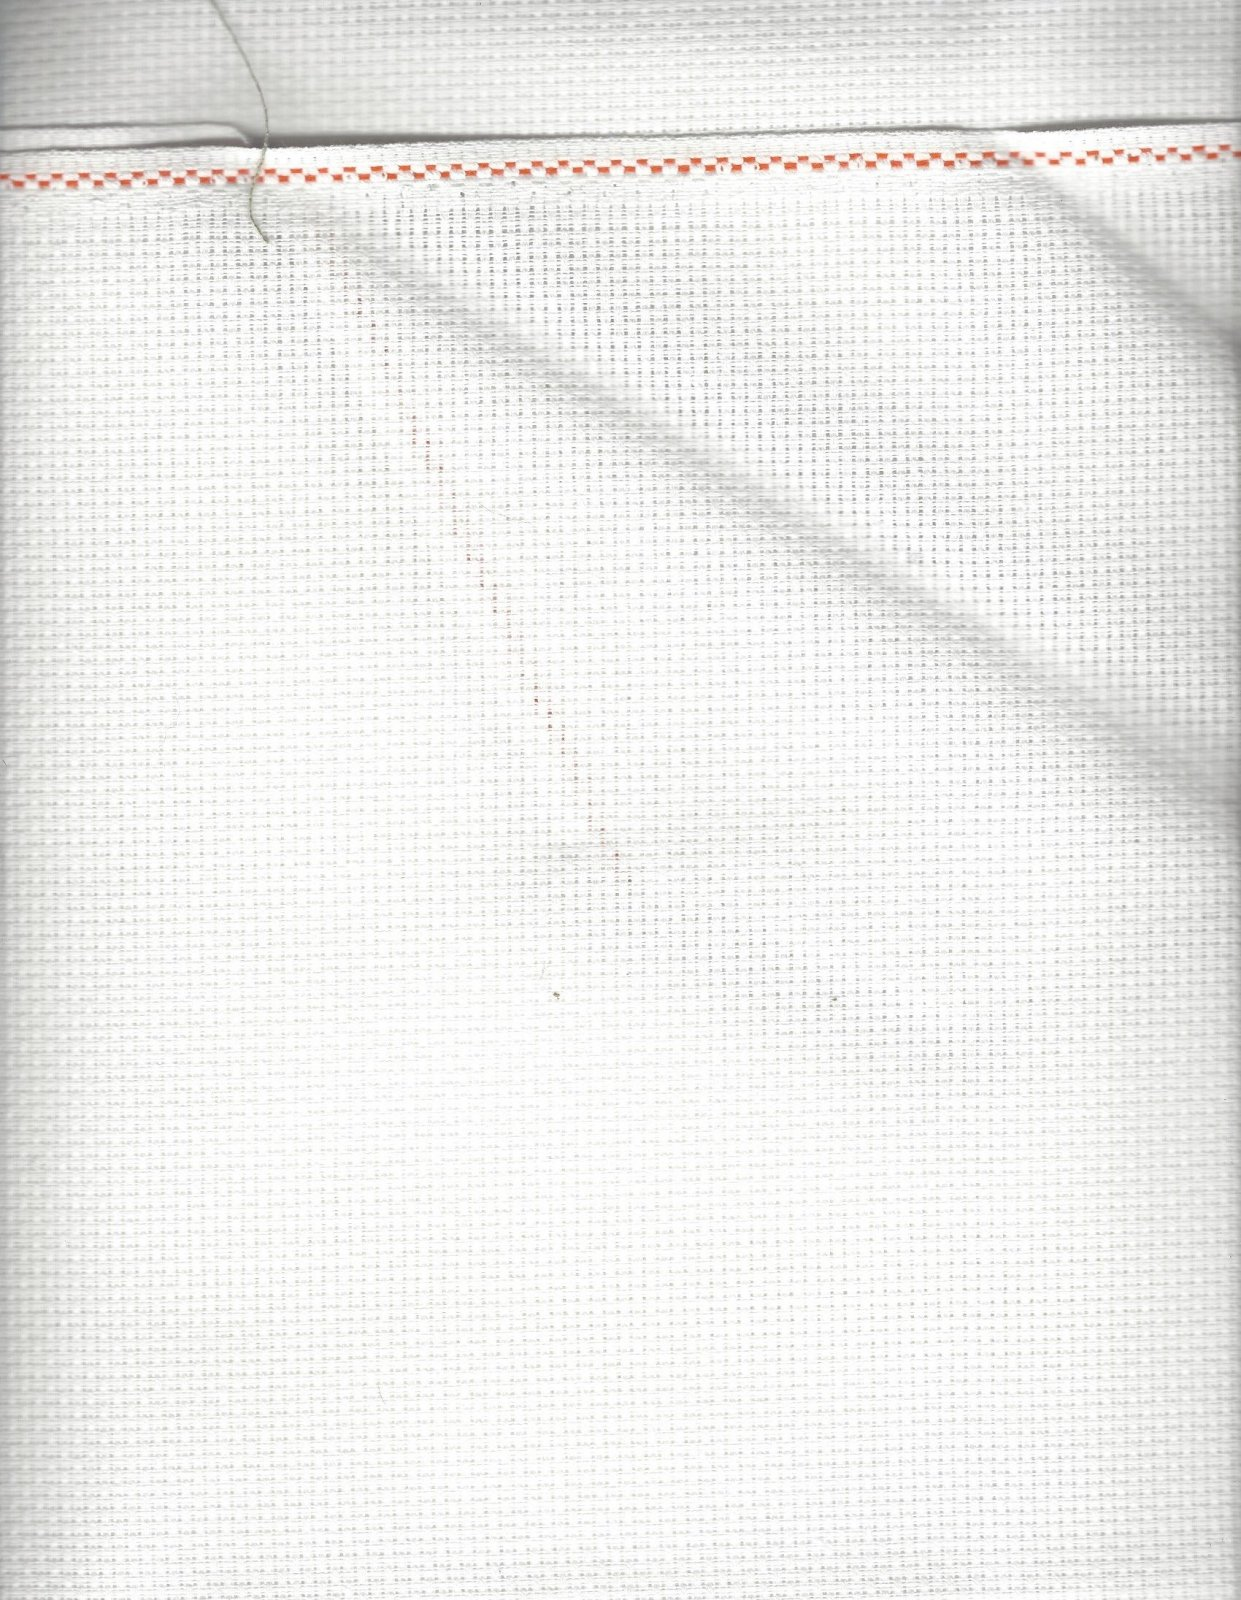 Aida 11ct Pearl White(discontinued color)